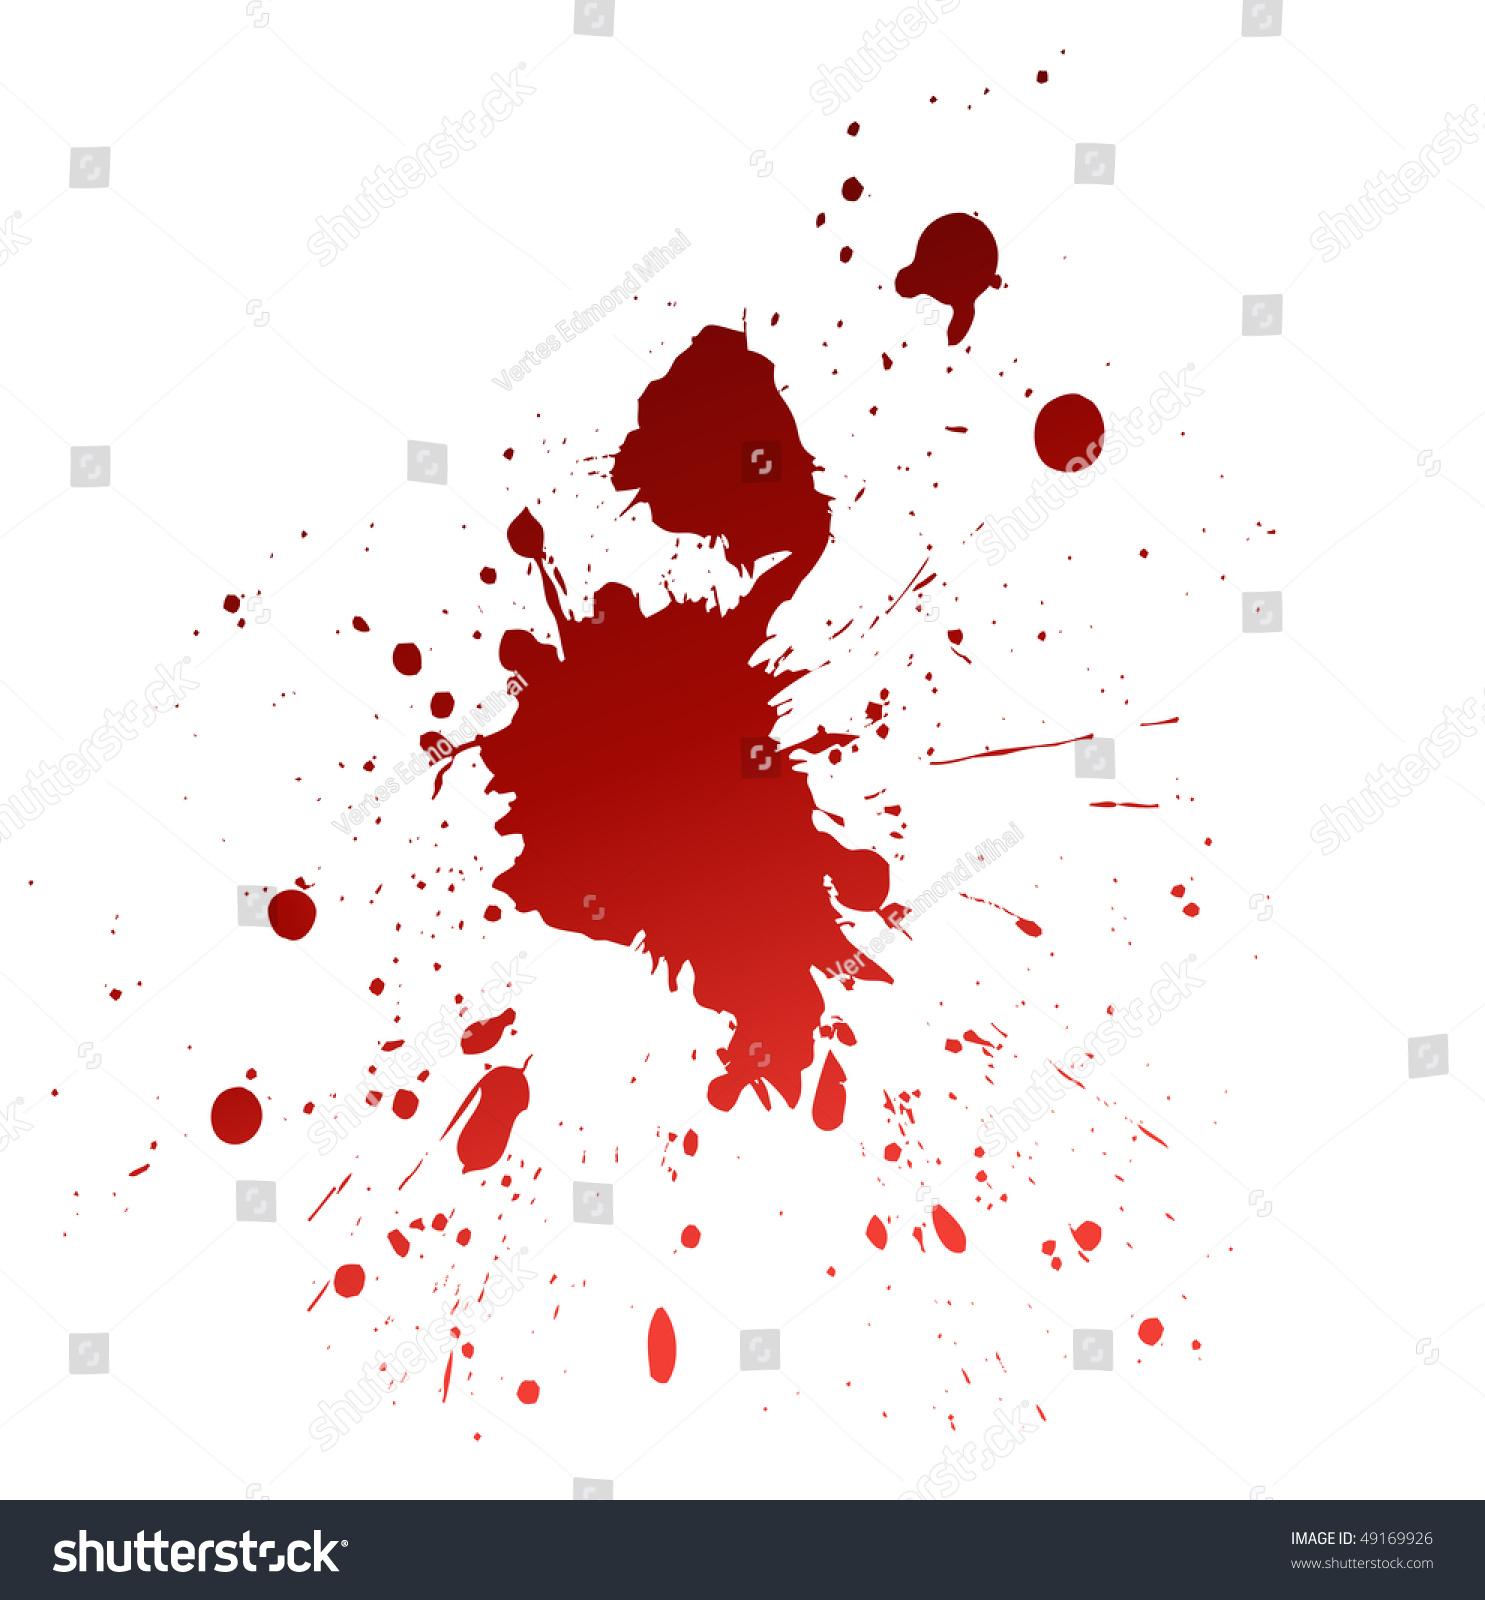 Blood splat Stock Photo 49169926 - Avopix com